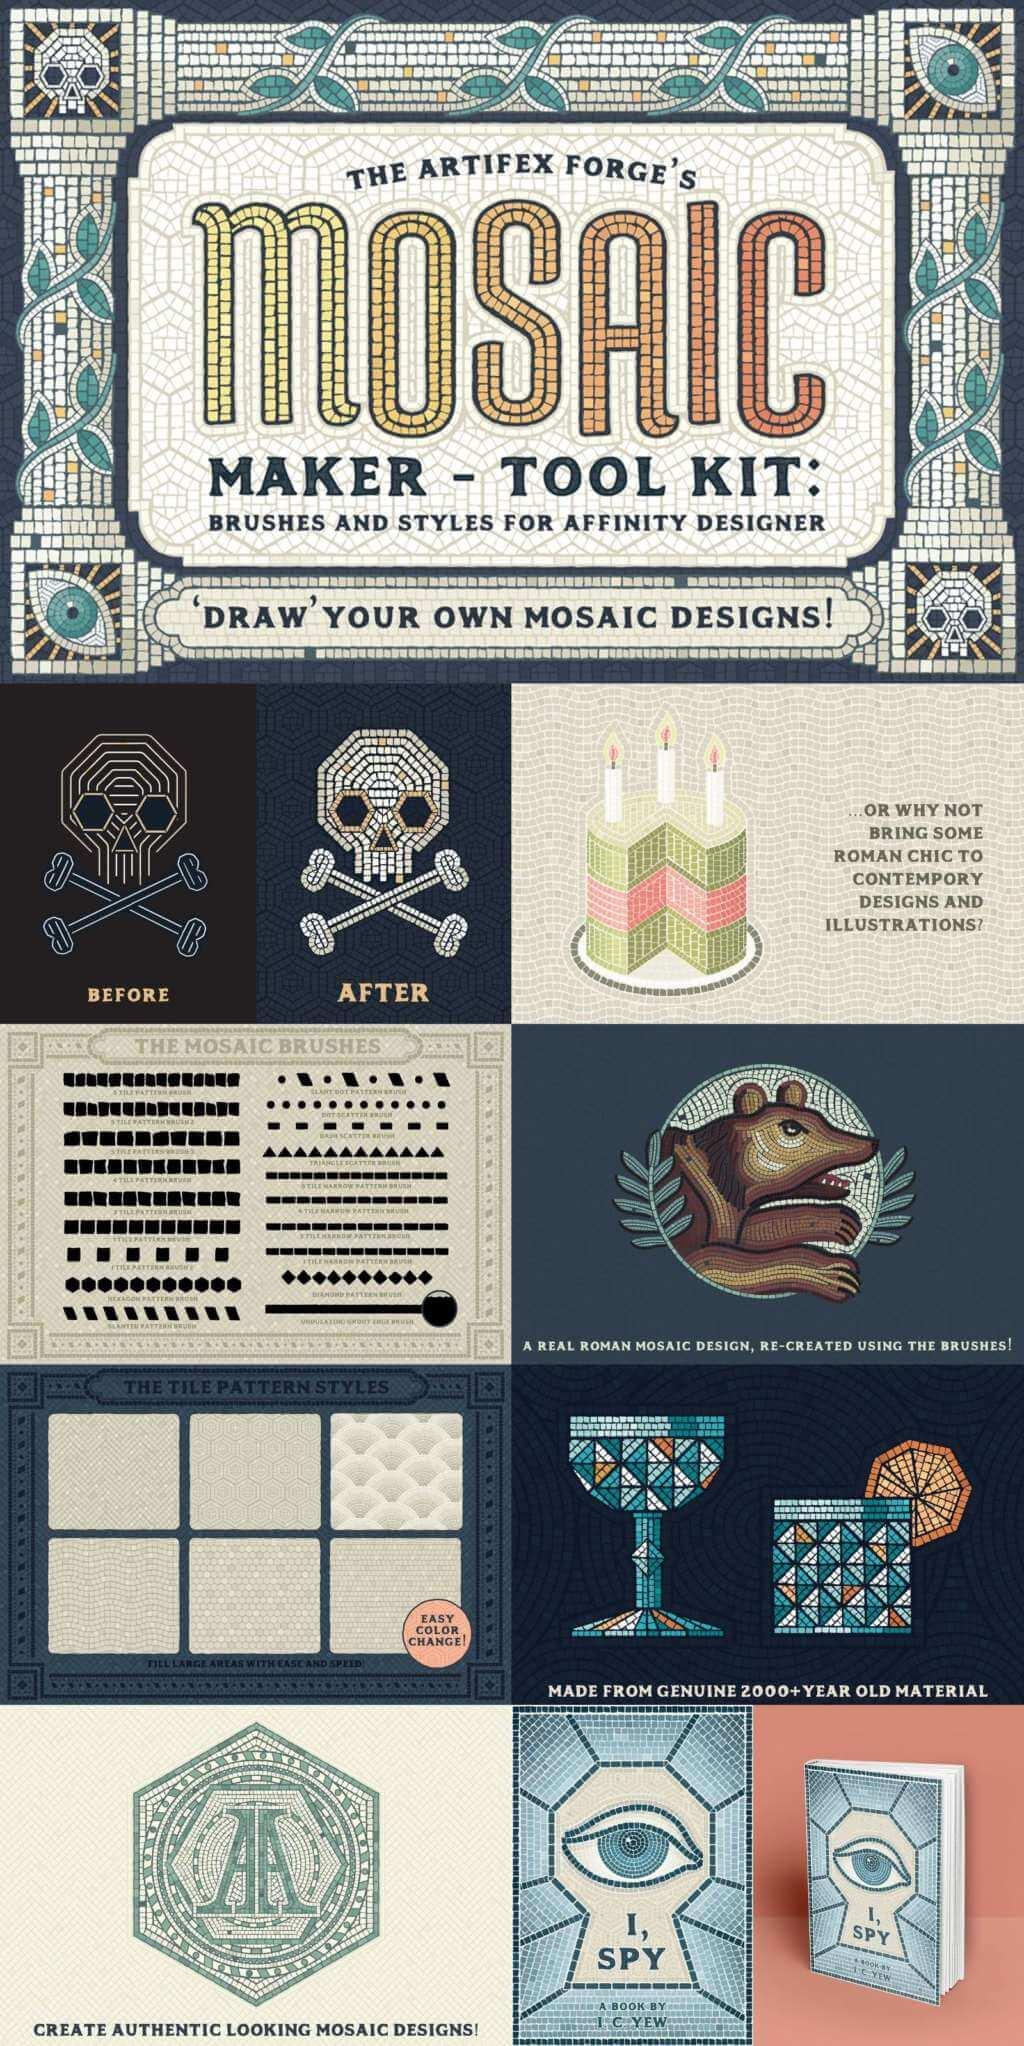 Mosaic Maker – Affinity Brushes & Patterns